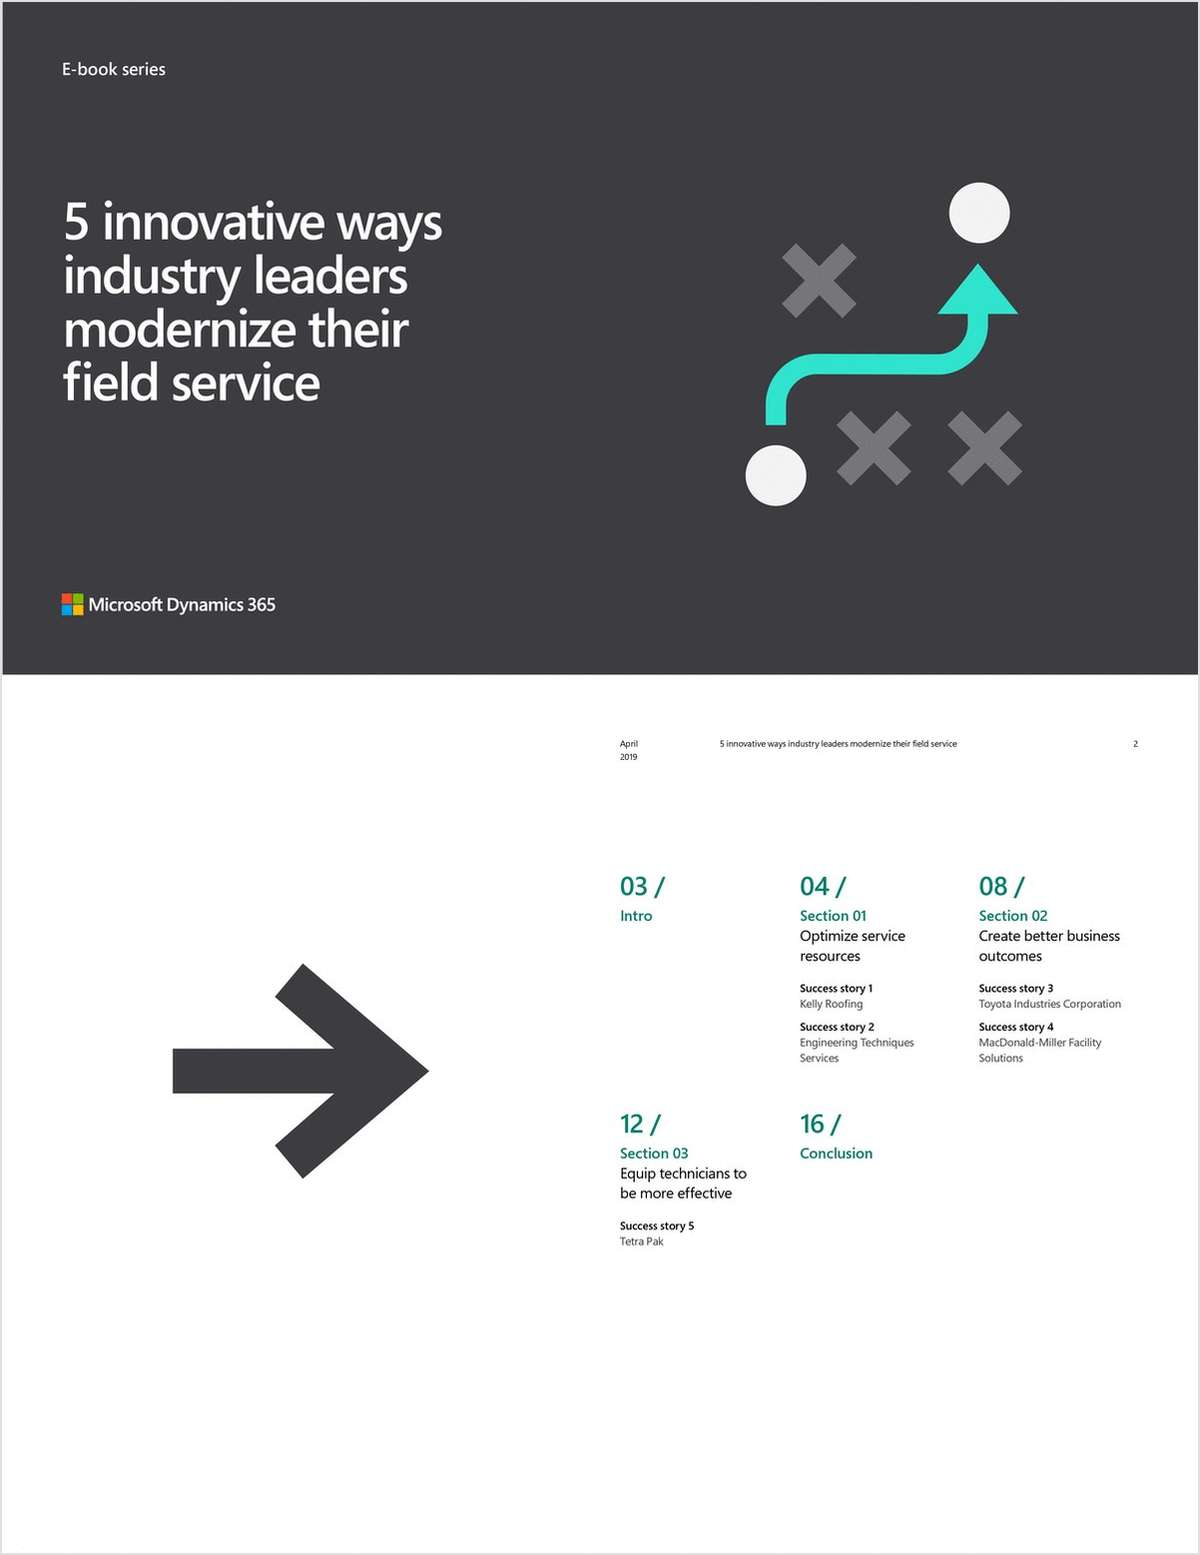 5 Innovative Ways Industry Leaders Modernize Their Field Service